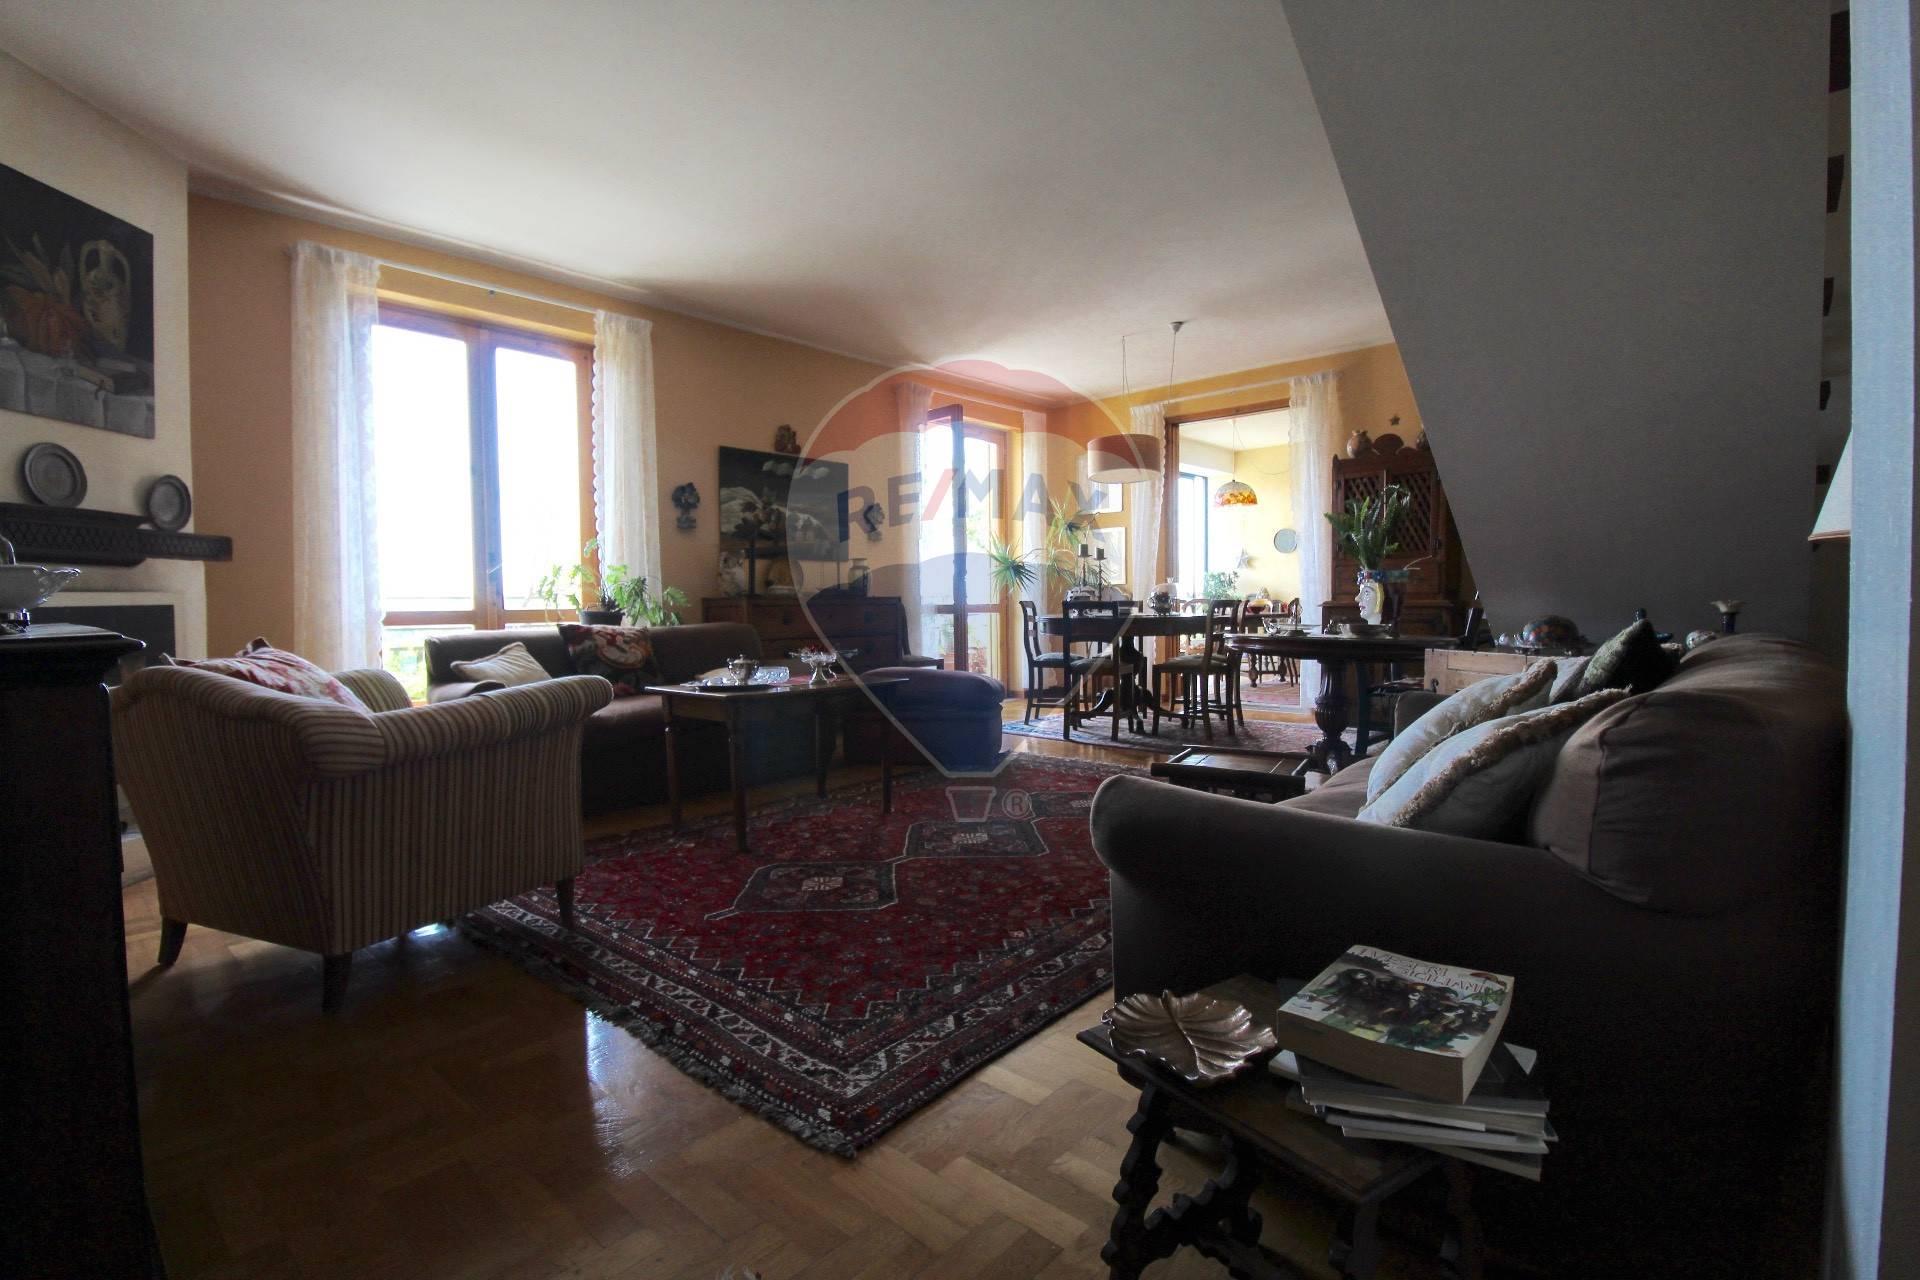 Appartamento in vendita San Nicolò-via santi Bonaccorsi Aci Catena